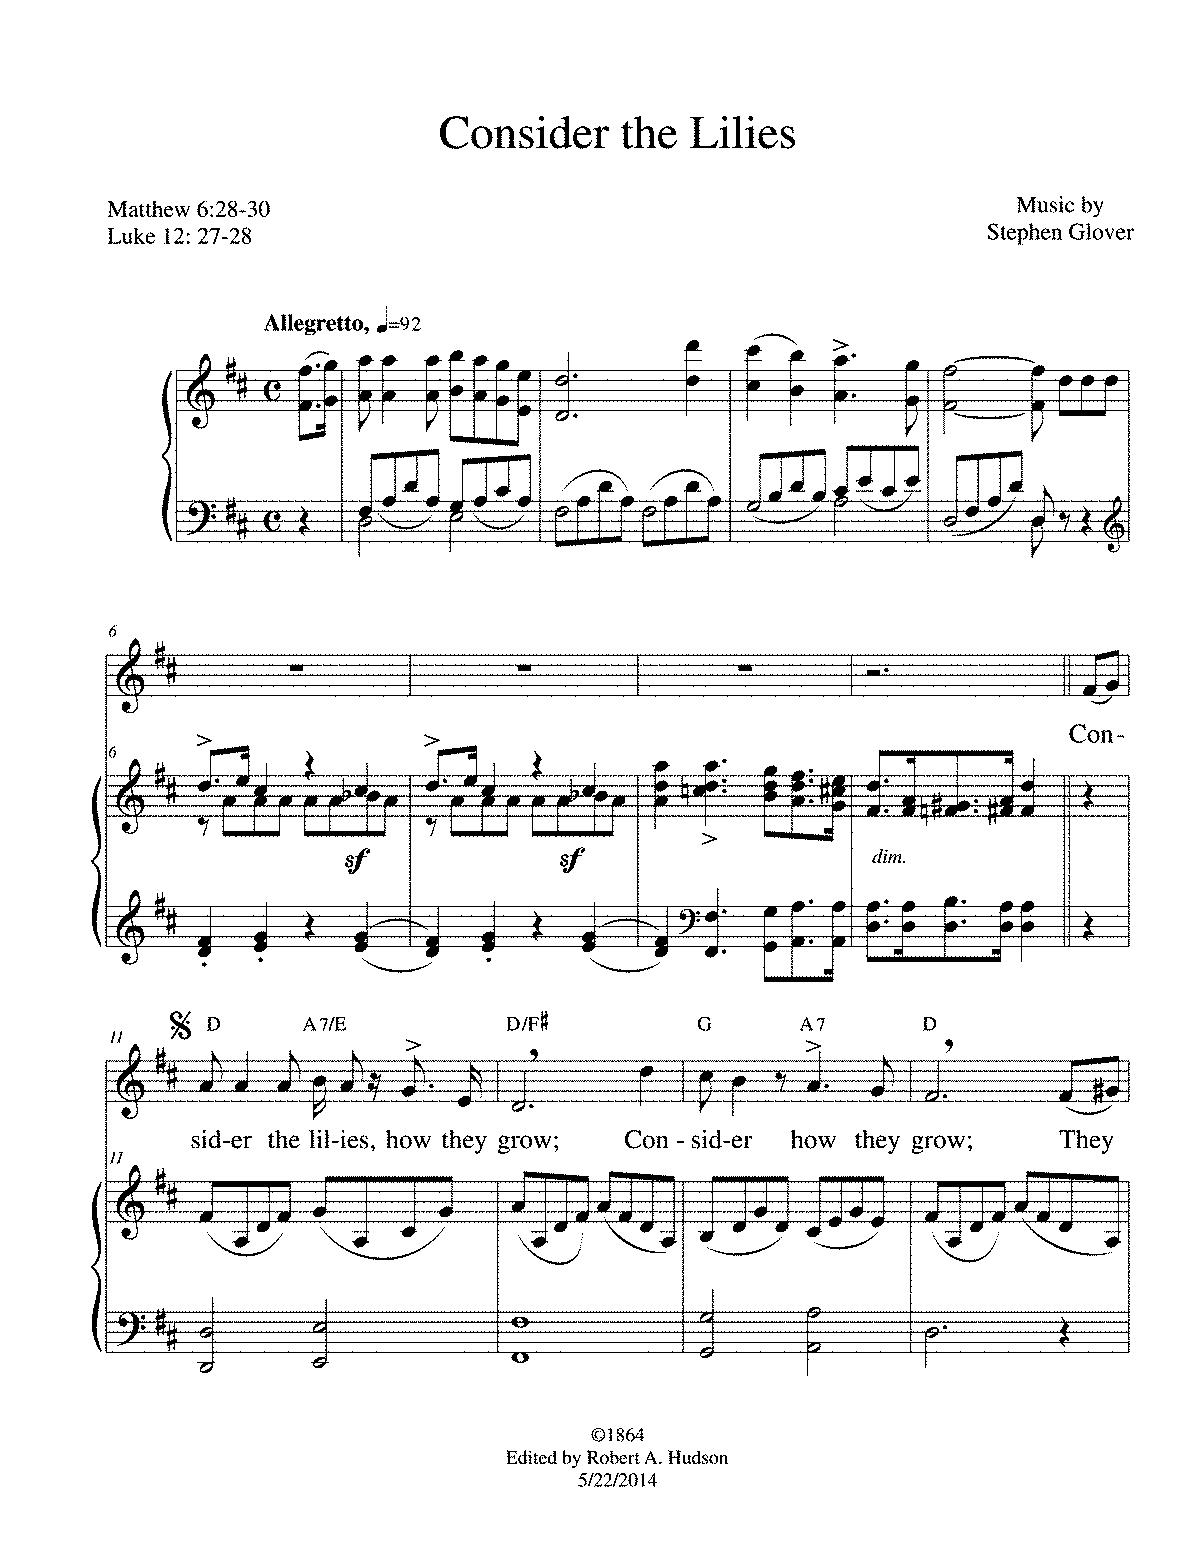 free public domain sheet music pdf